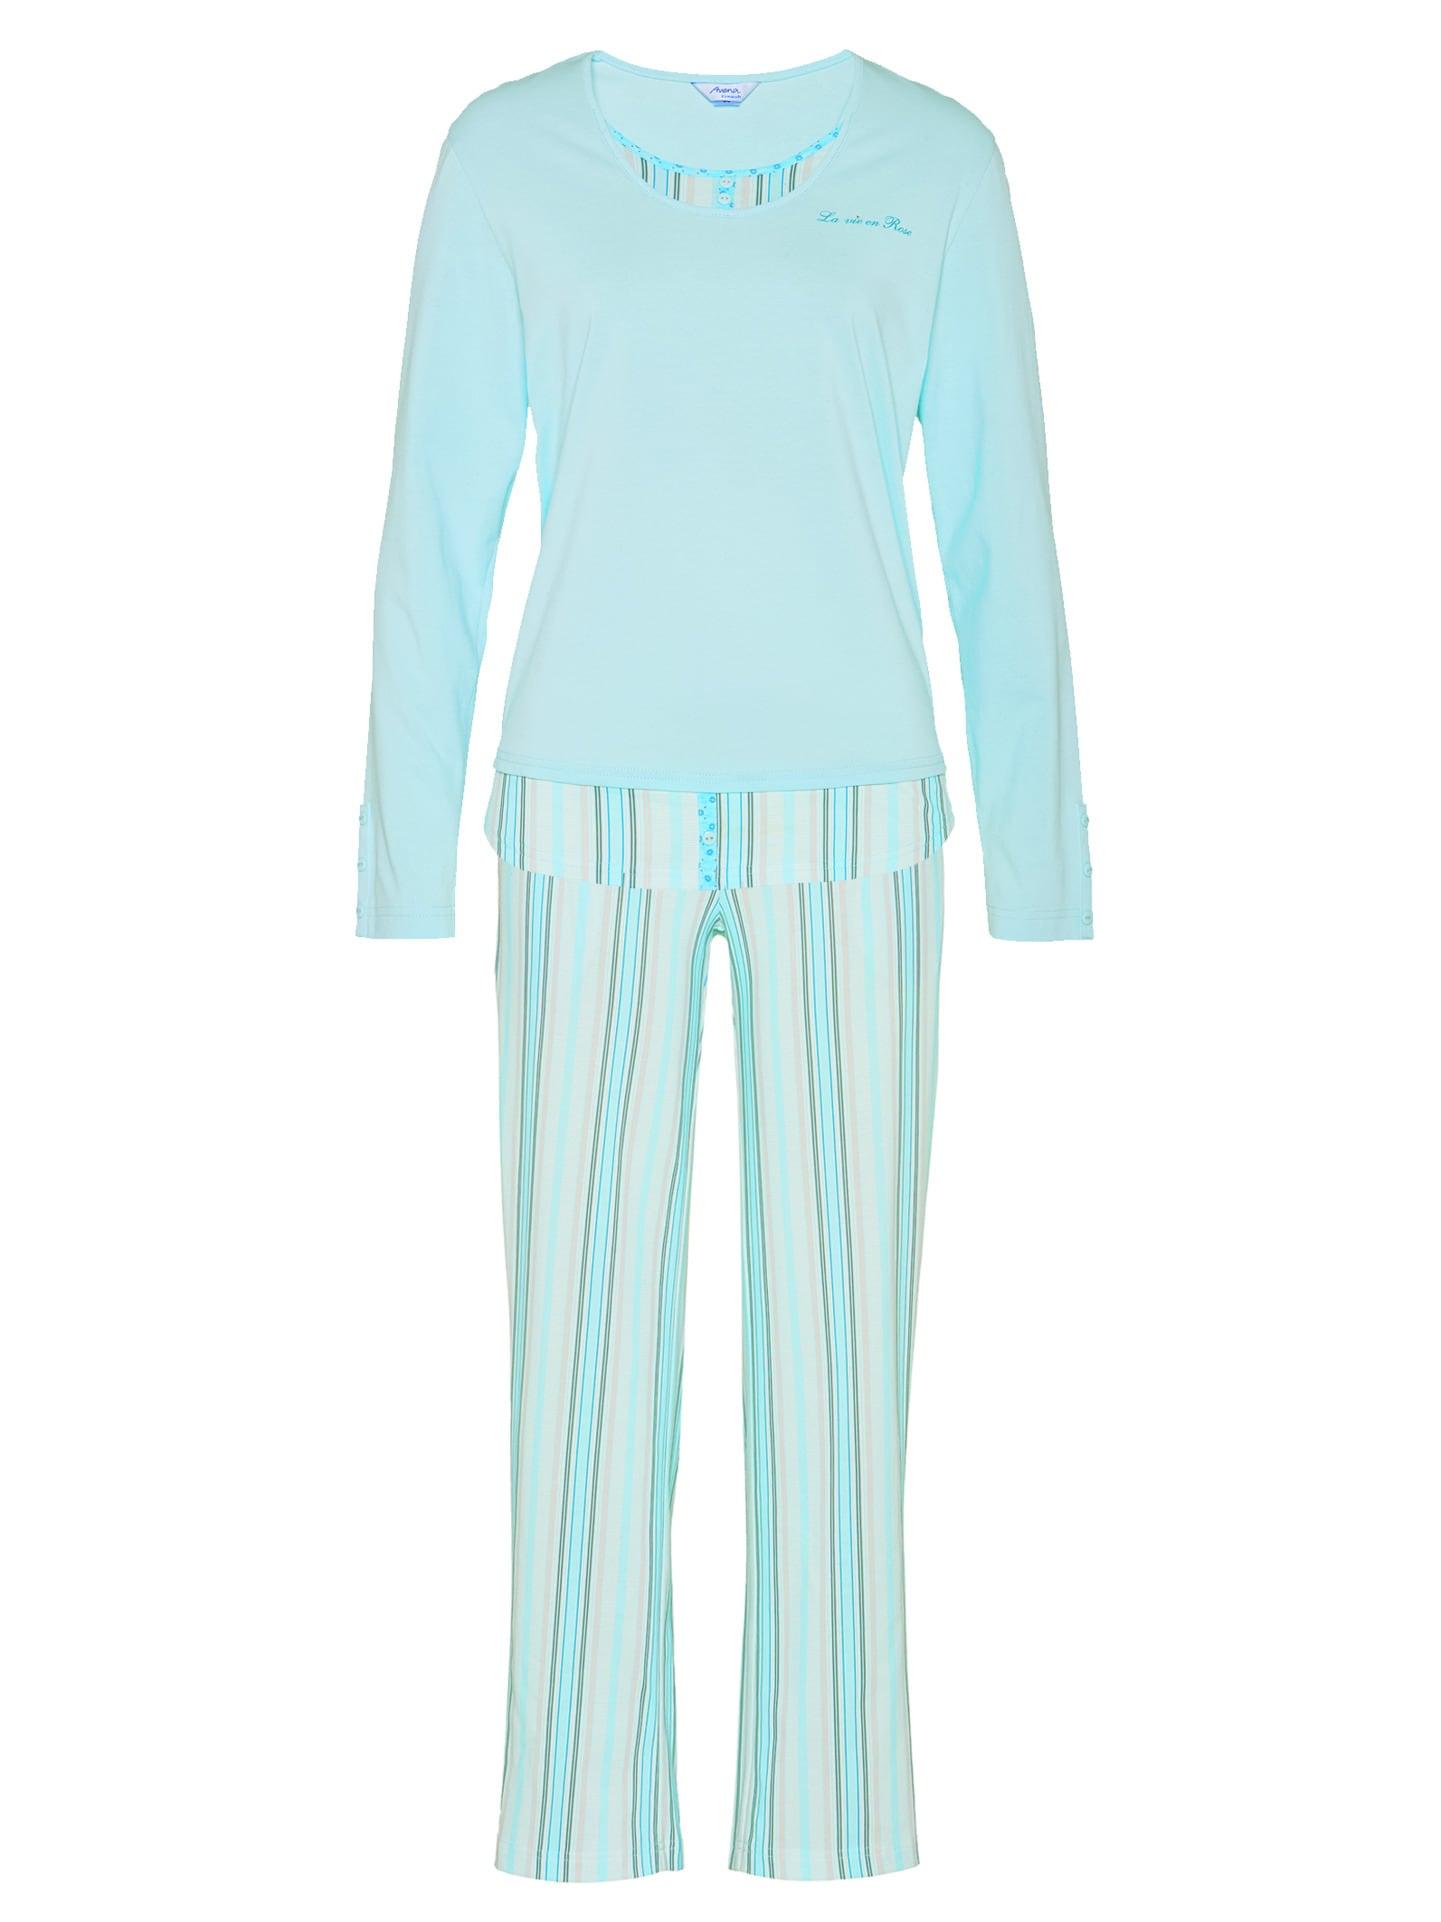 Avena Damen Pyjama Hellblau gestreift 42-6058-1_MV8880